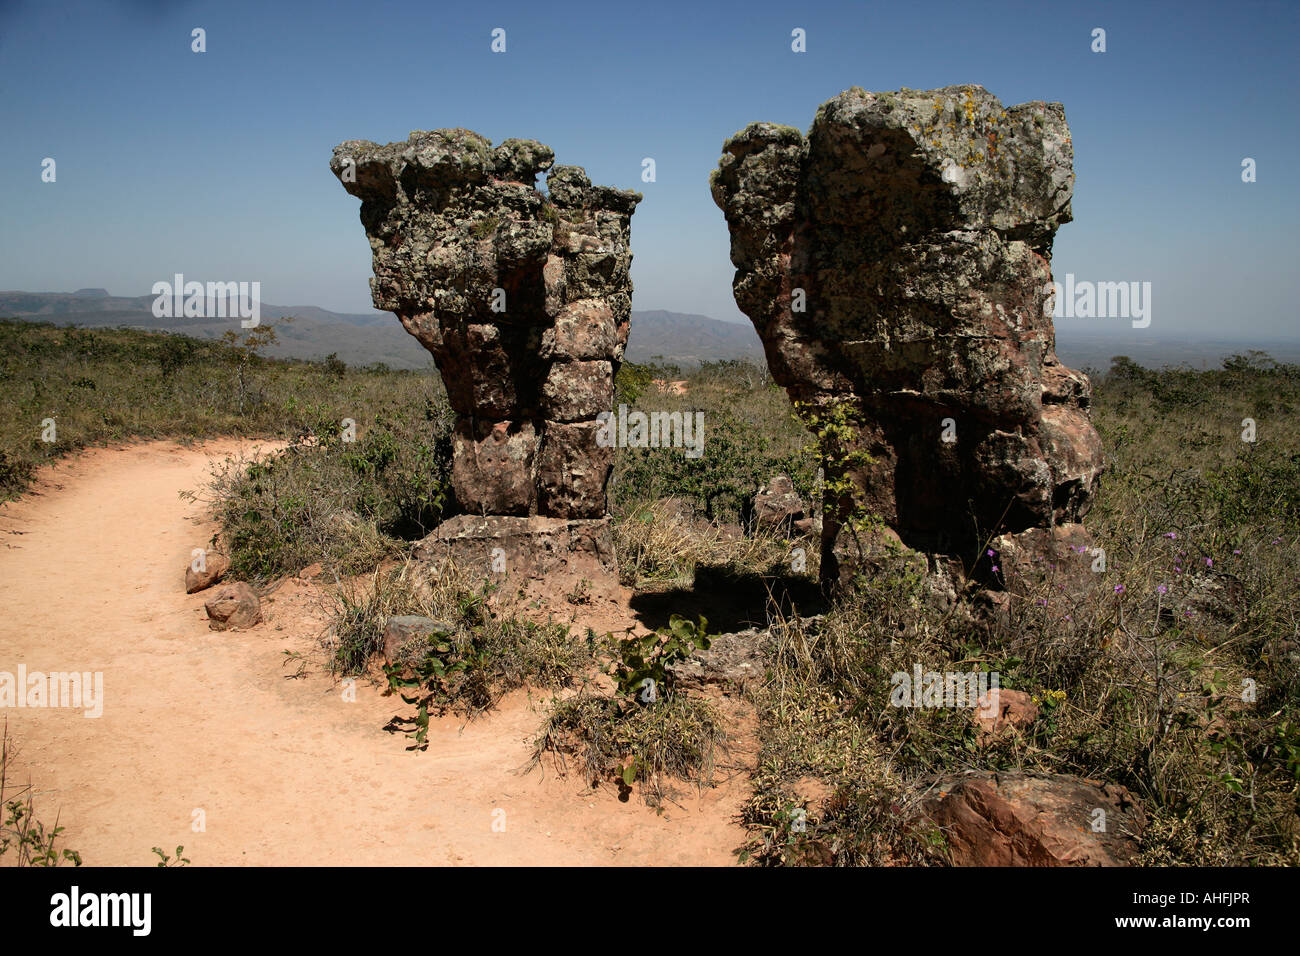 Stone city Chapada Brazil - Stock Image